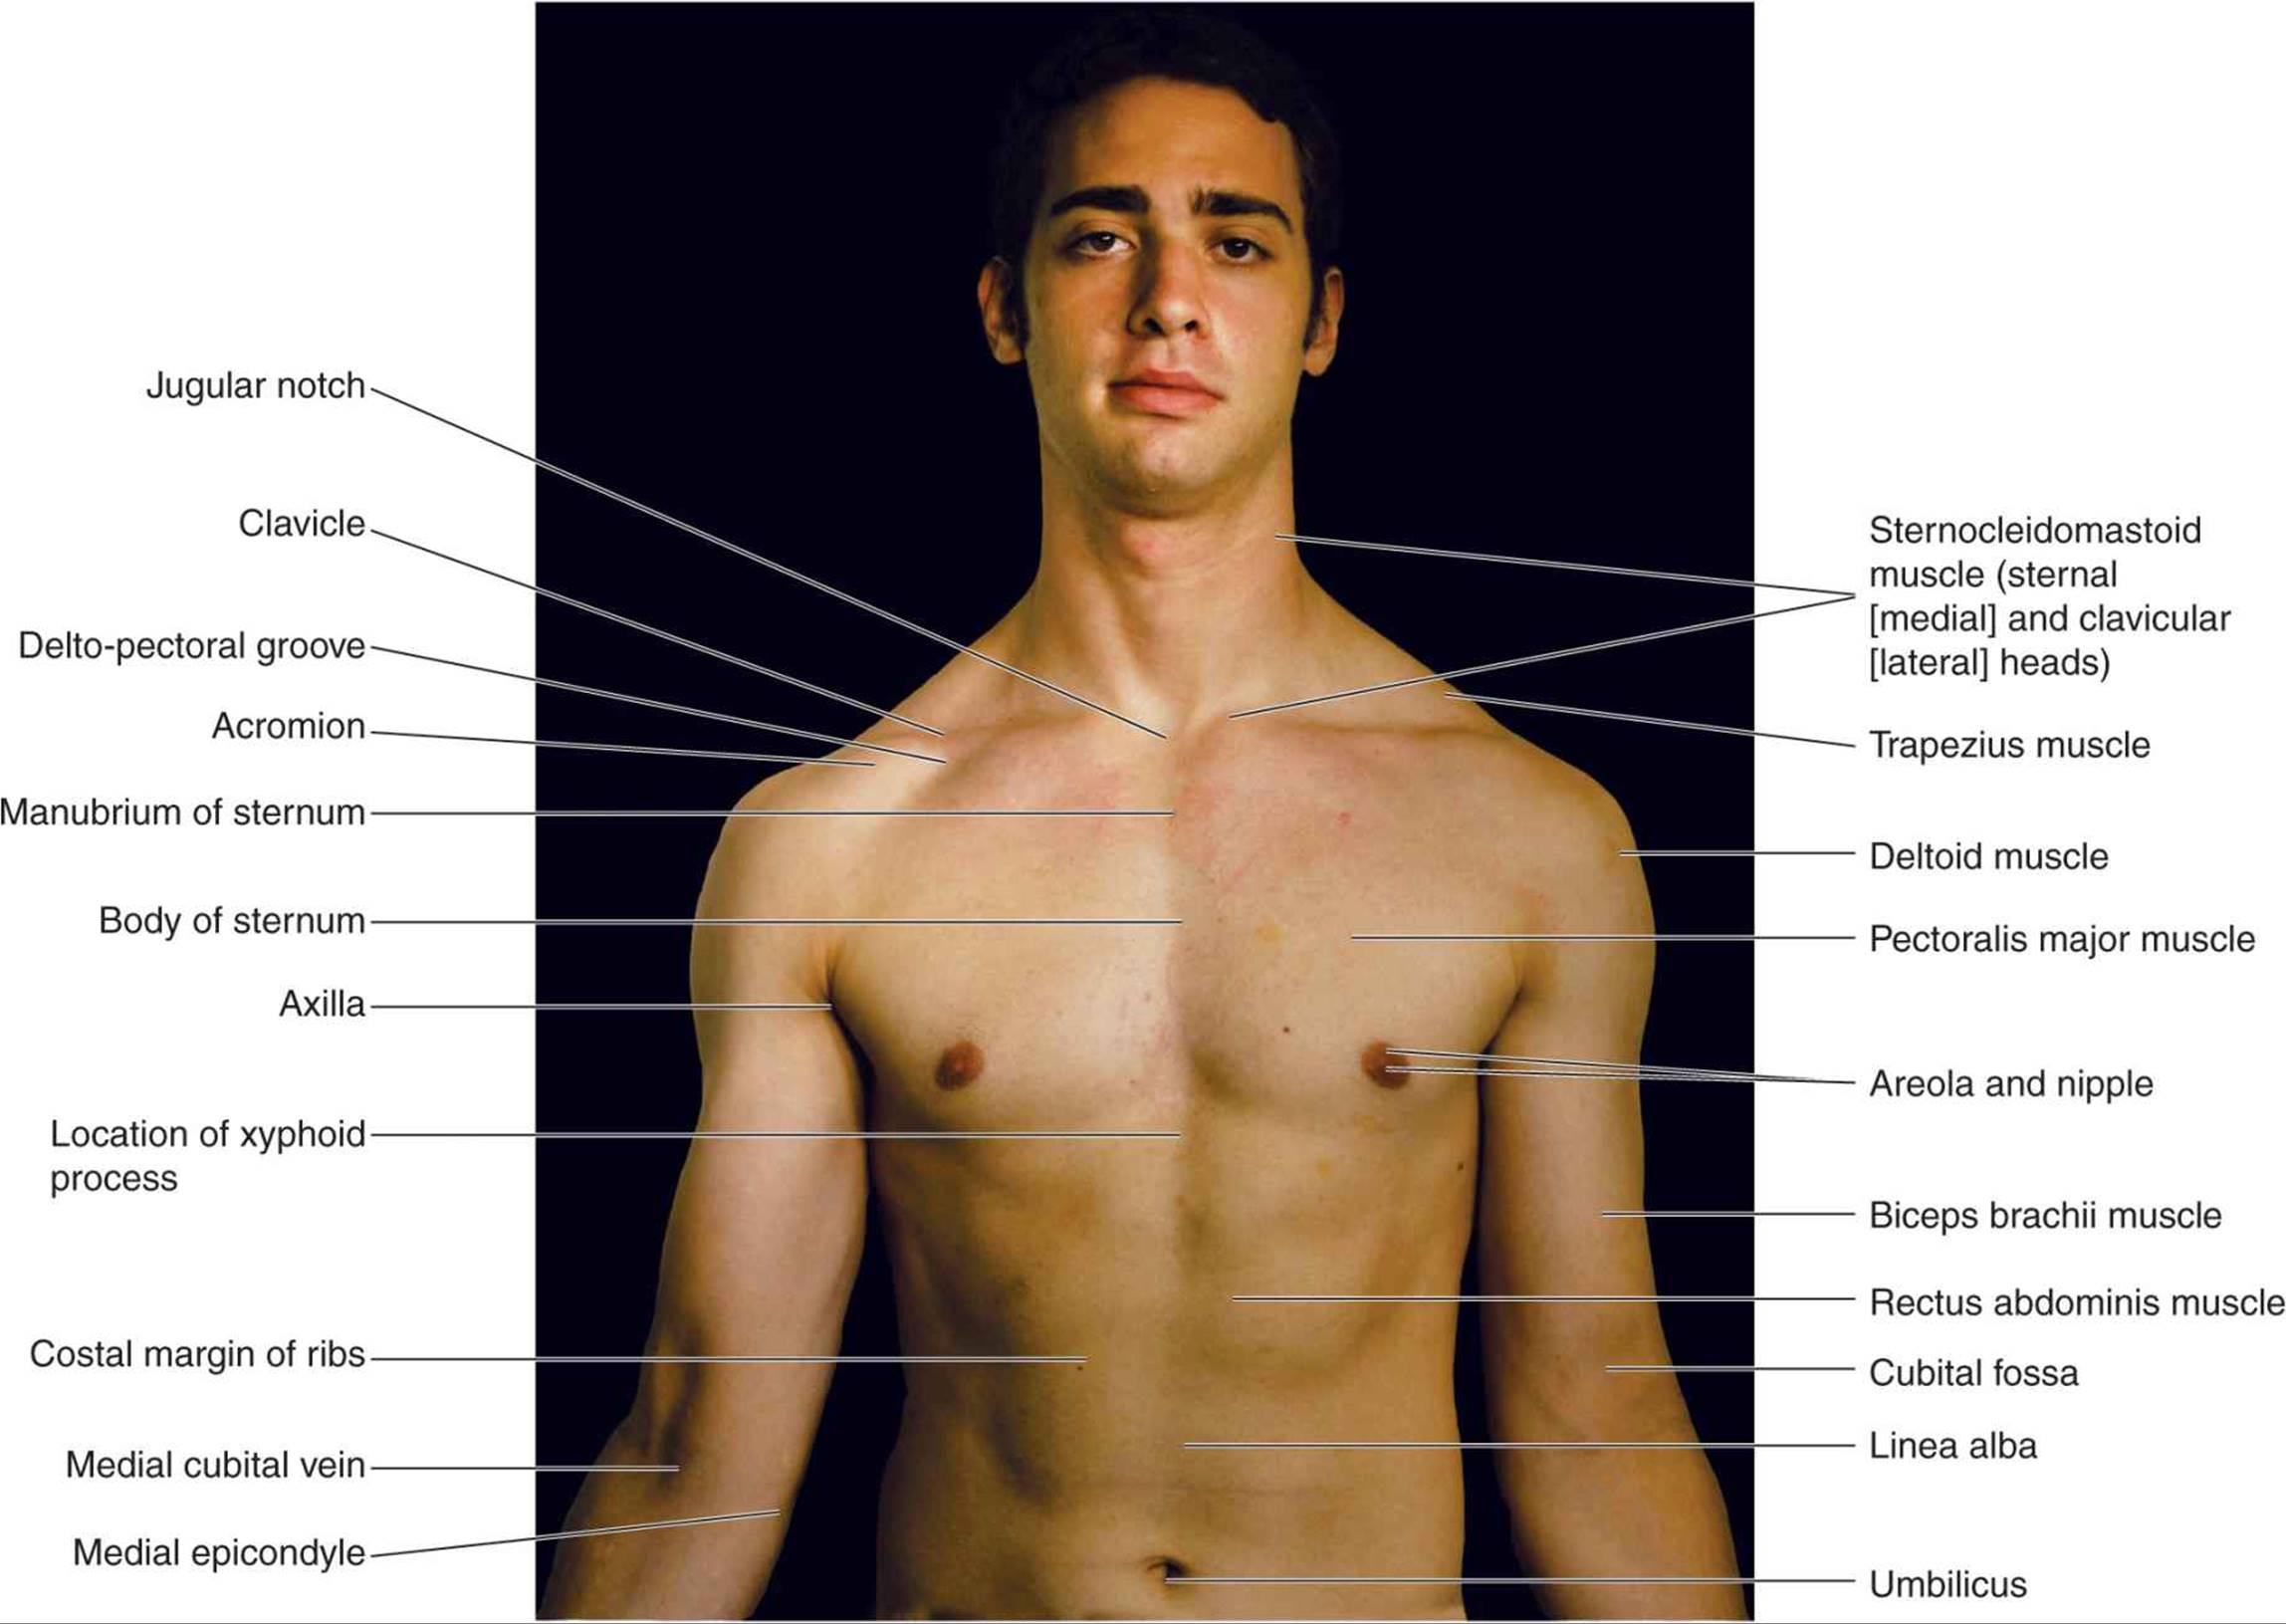 Atlas Of Surface Anatomy Hadzics Peripheral Nerve Blocks And